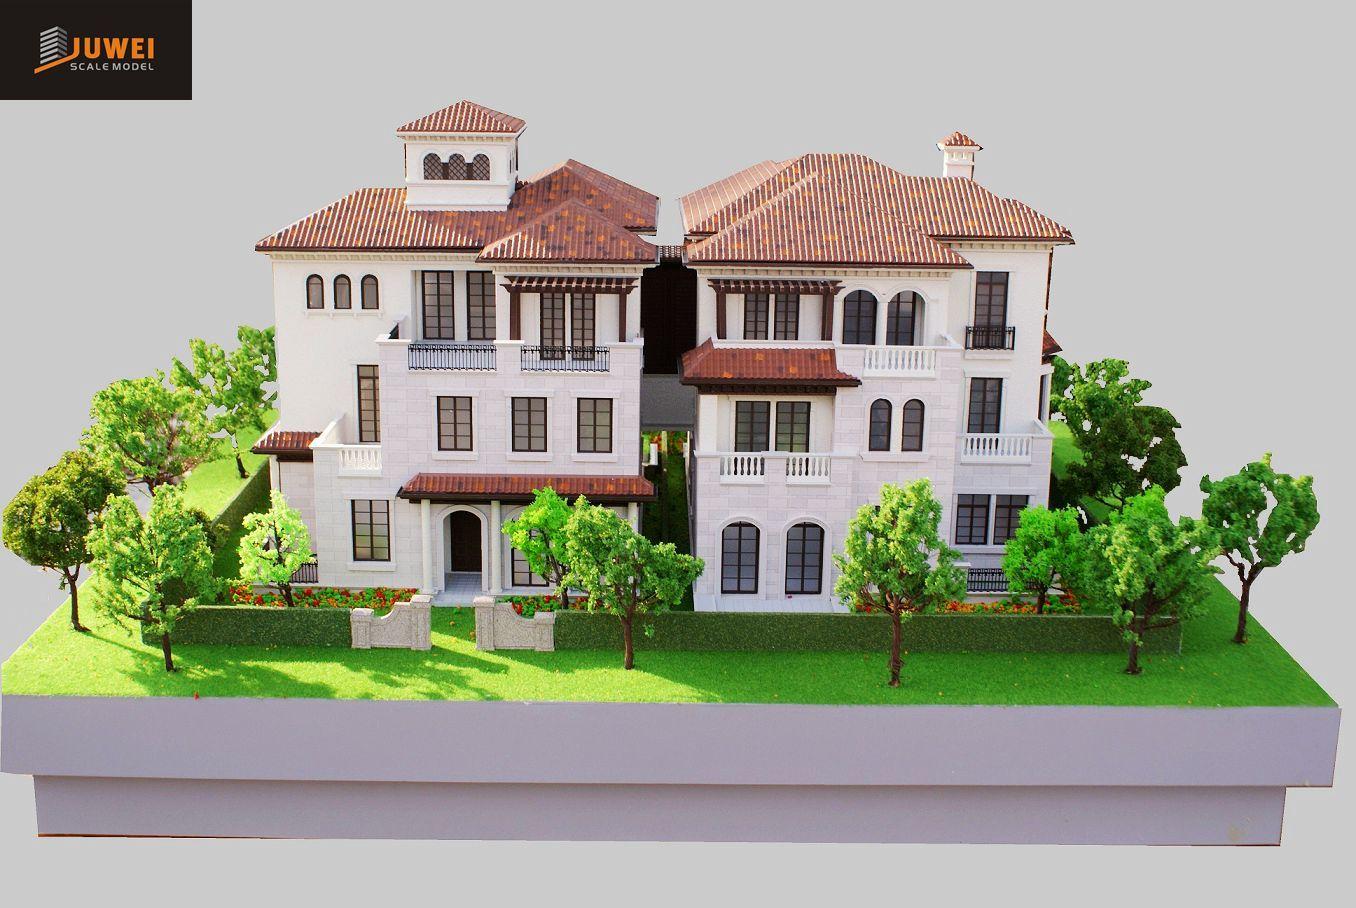 Architectural Scale Model Making, 1: 50 Villa Model (JW-254